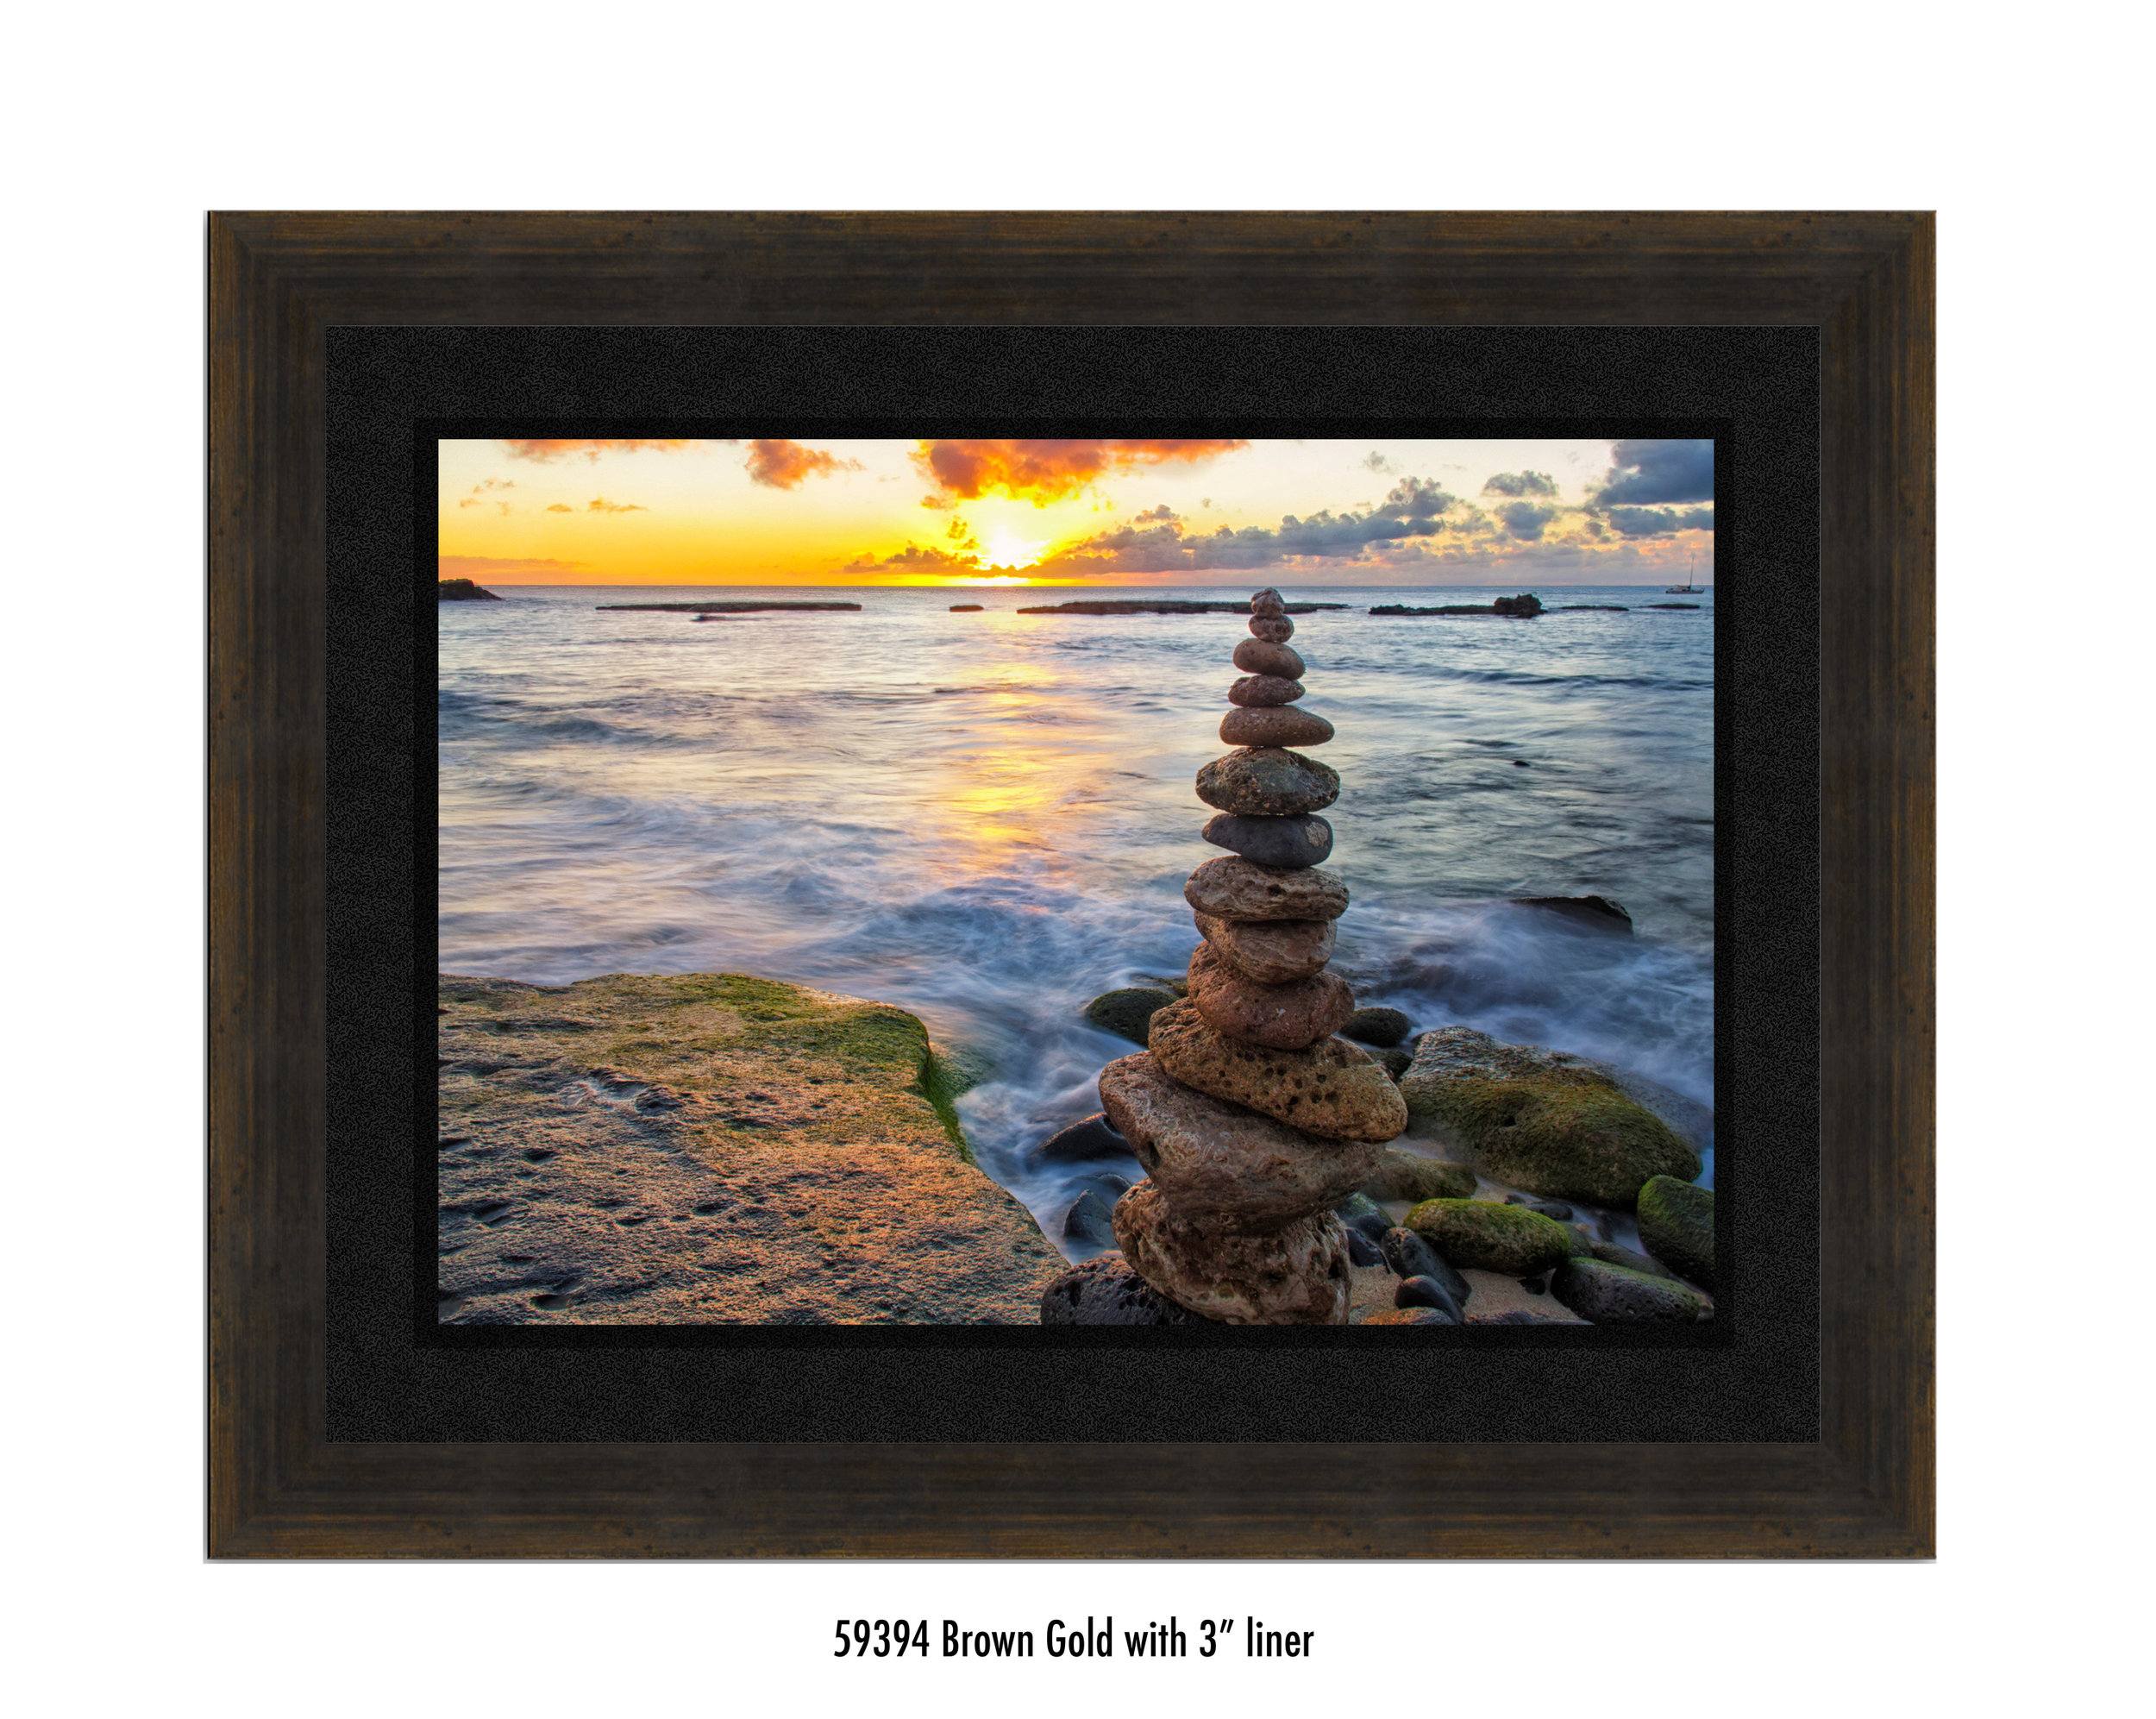 Ahu-Sunset-59394-3-blk.jpg